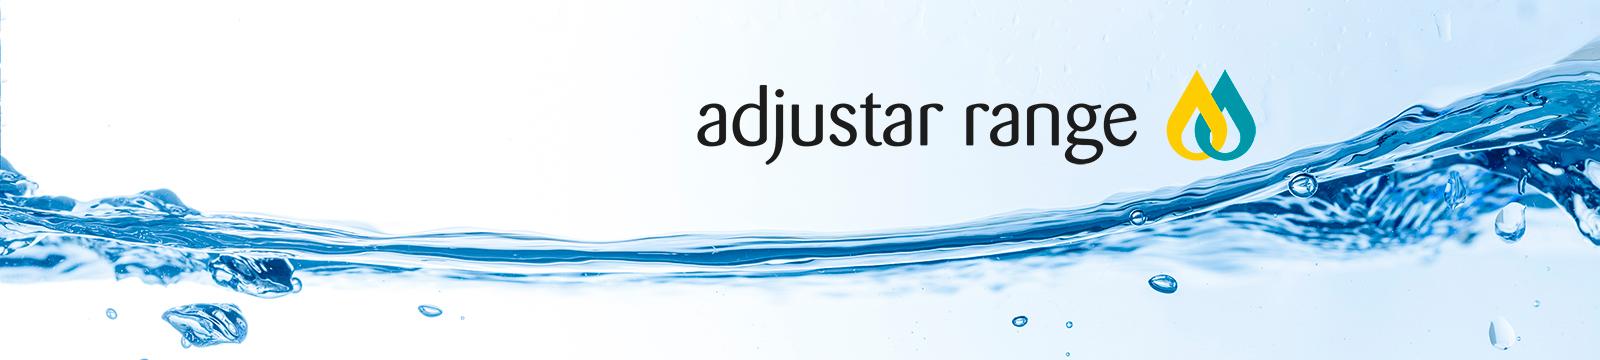 Adjustar: the new range to revolutionize the Adjuvants Market